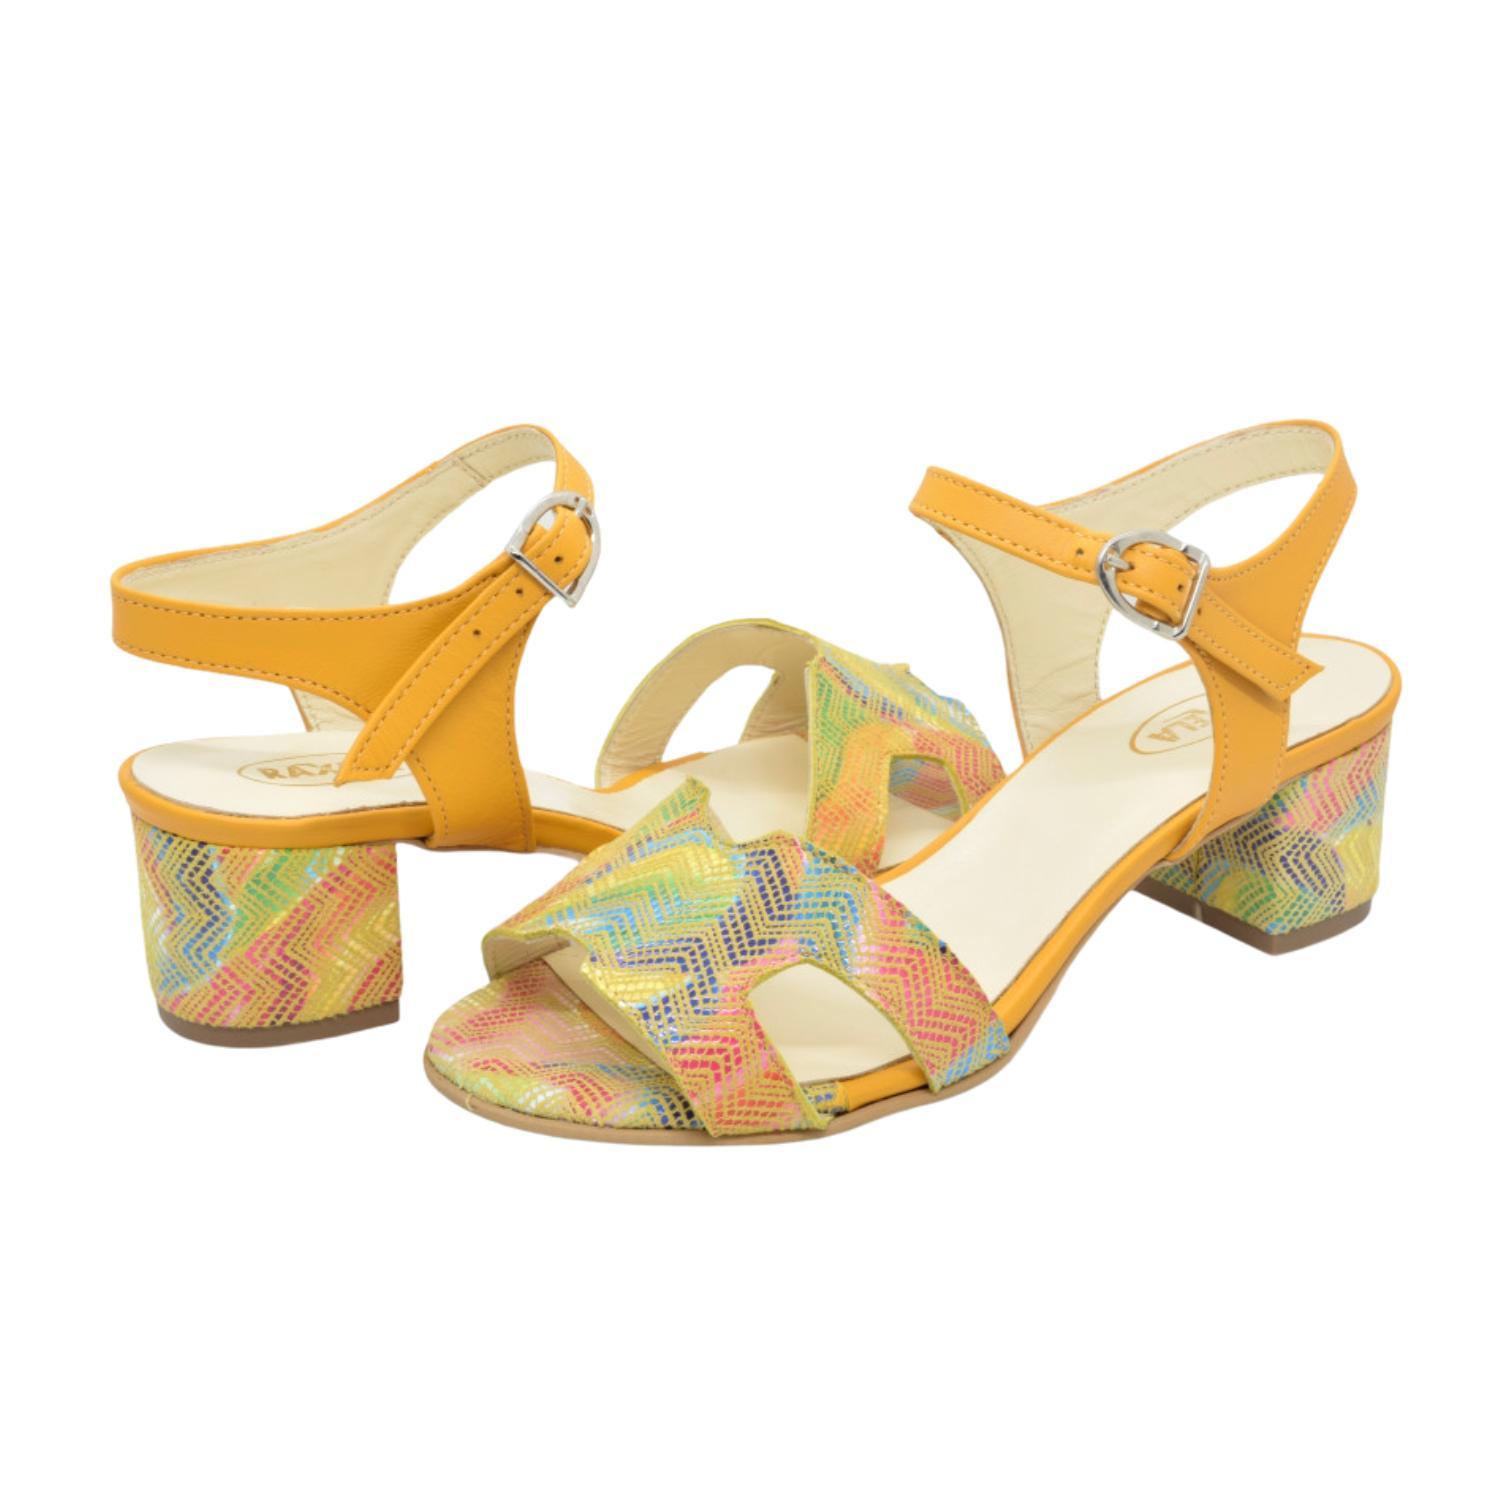 Sandale galbene cu model zig zag